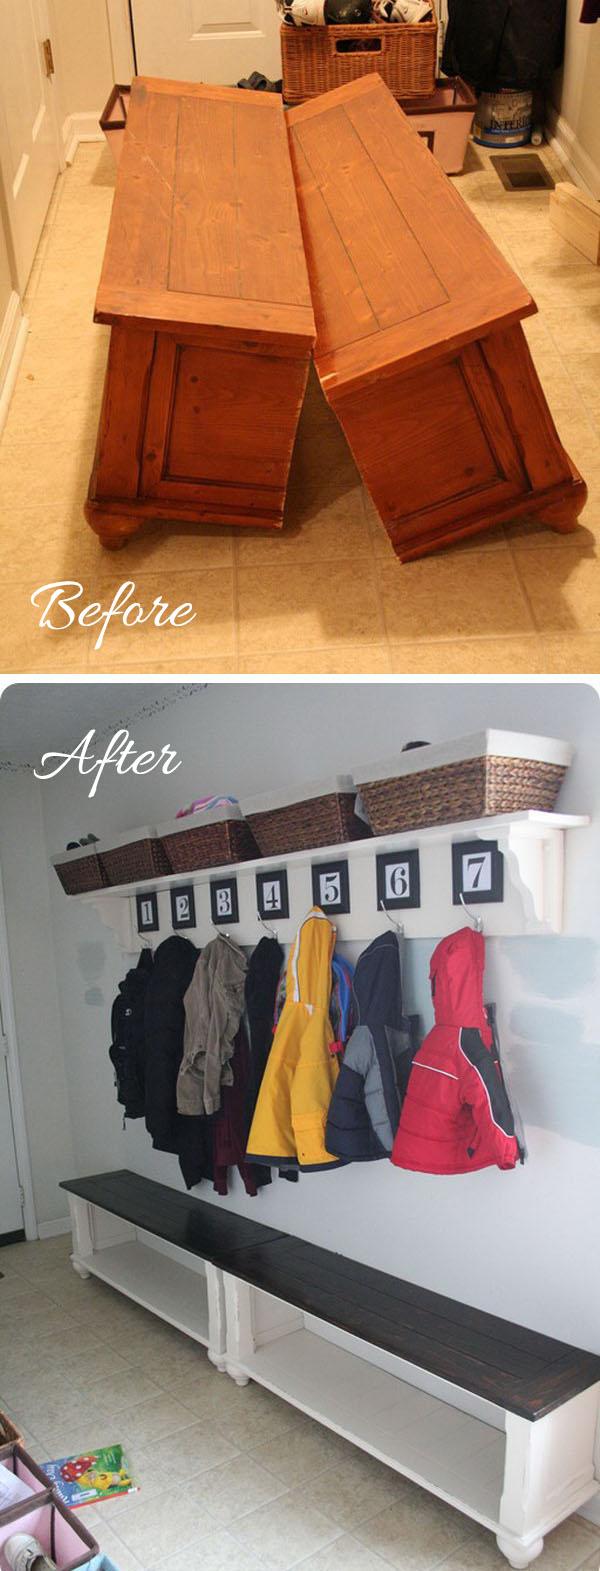 1 entryway makeover diy ideas tutorials - 30+ DIY Ideas to Give a Makeover to a Your Entryway